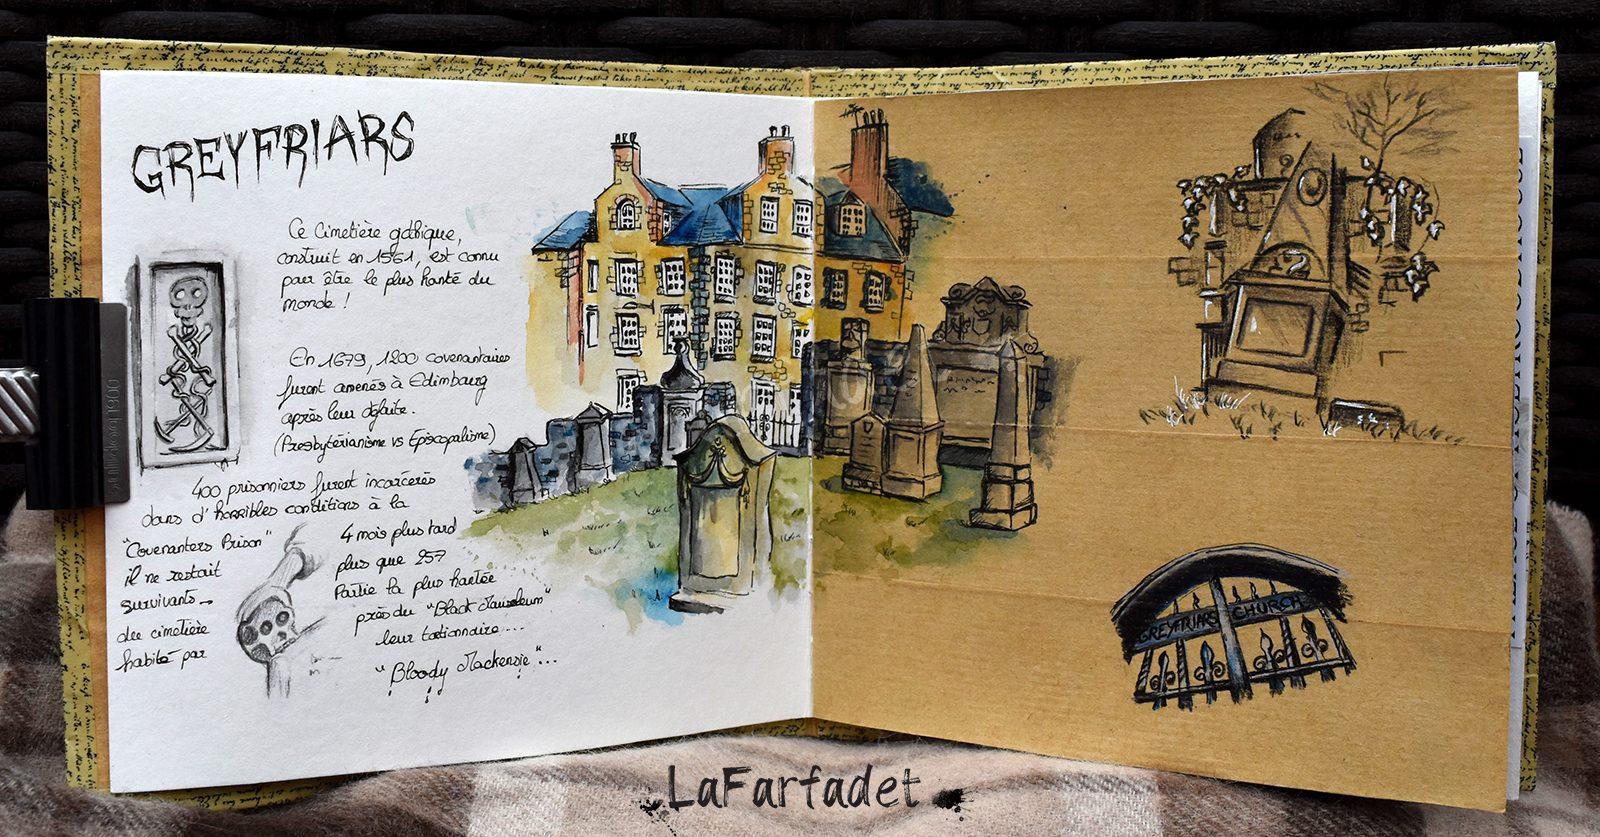 2019 Carnet de voyage Edimbourg Greyfriars Elodie Vasseur Lafarfadet